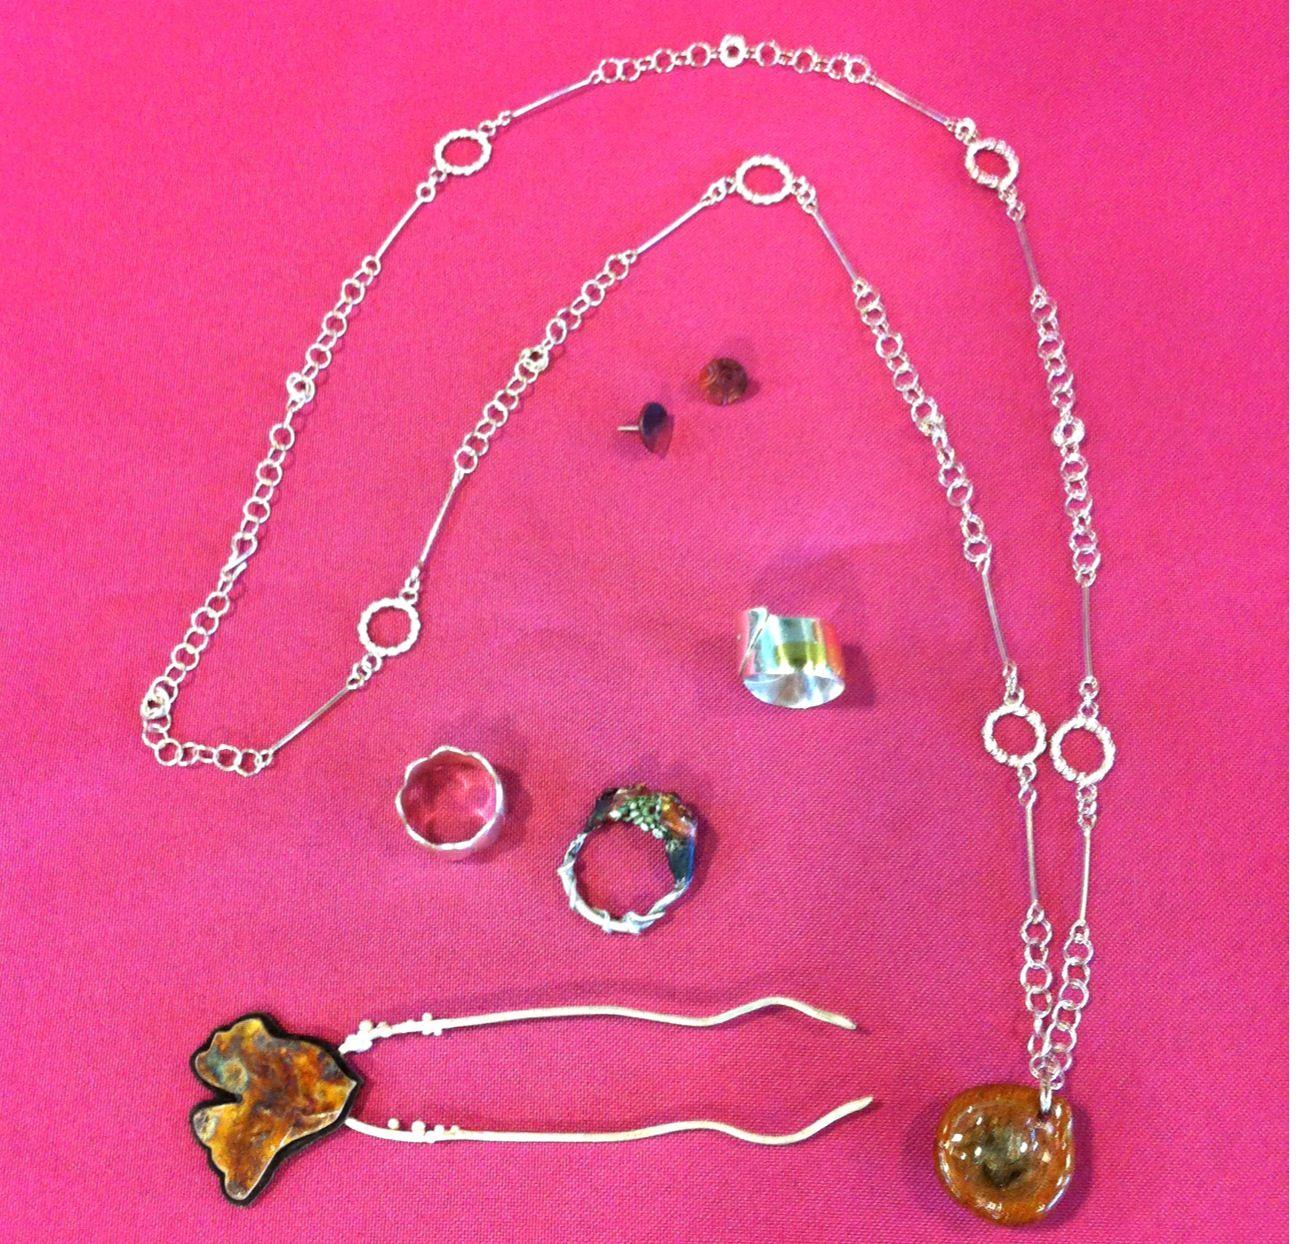 Kristina Albright 2014 - Jewellery Certificate